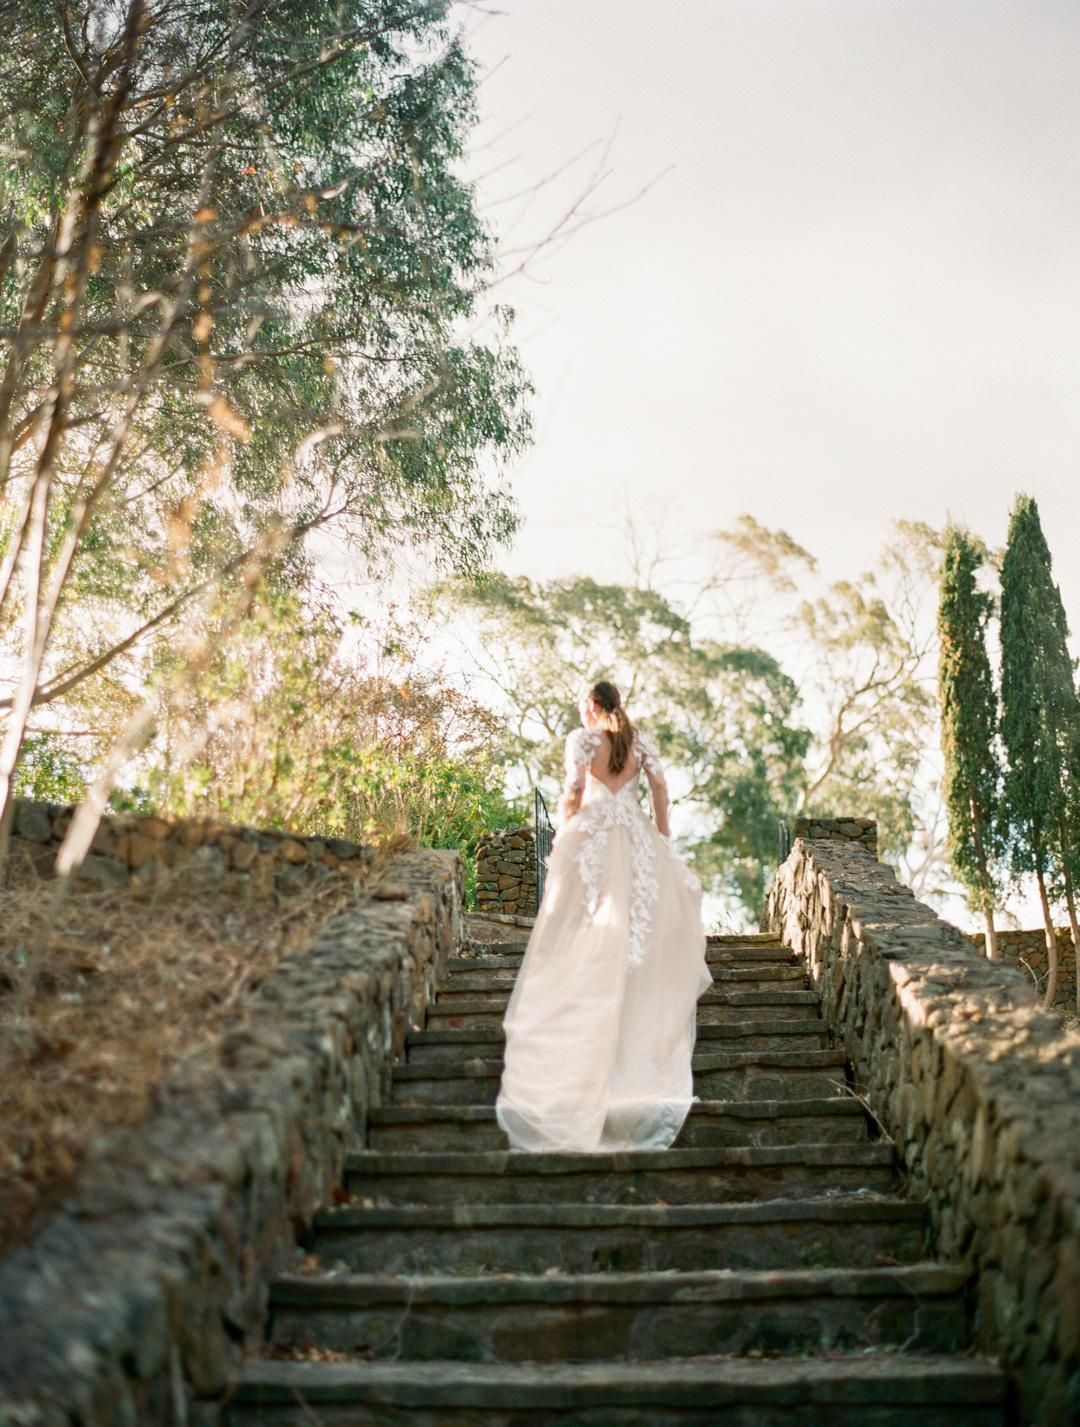 Hopewood-House-Natures-Embrace-Photoshoot-Amelia-Soegijono-Photography-5.jpg